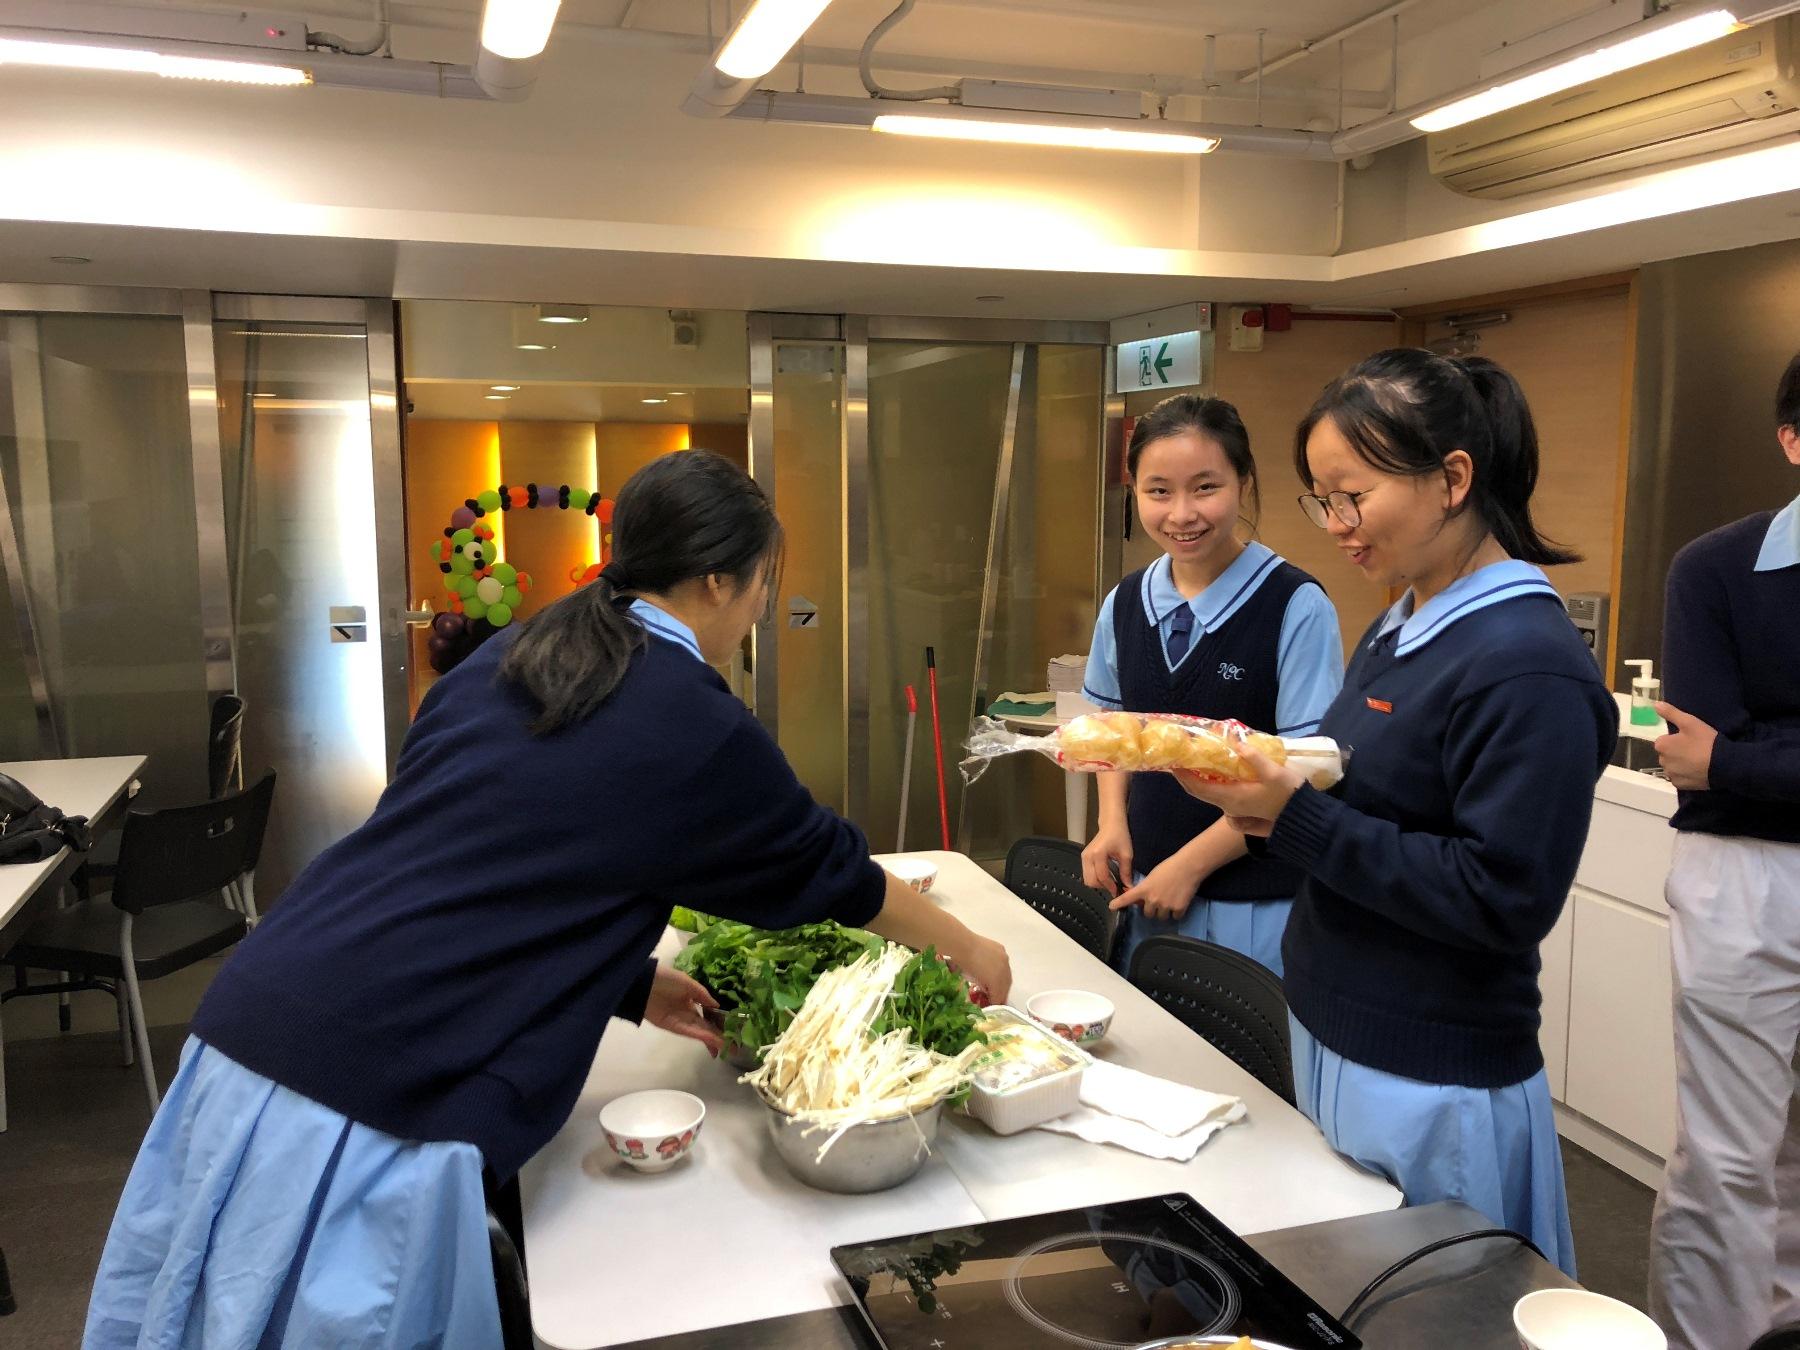 http://npc.edu.hk/sites/default/files/img_9698.jpg